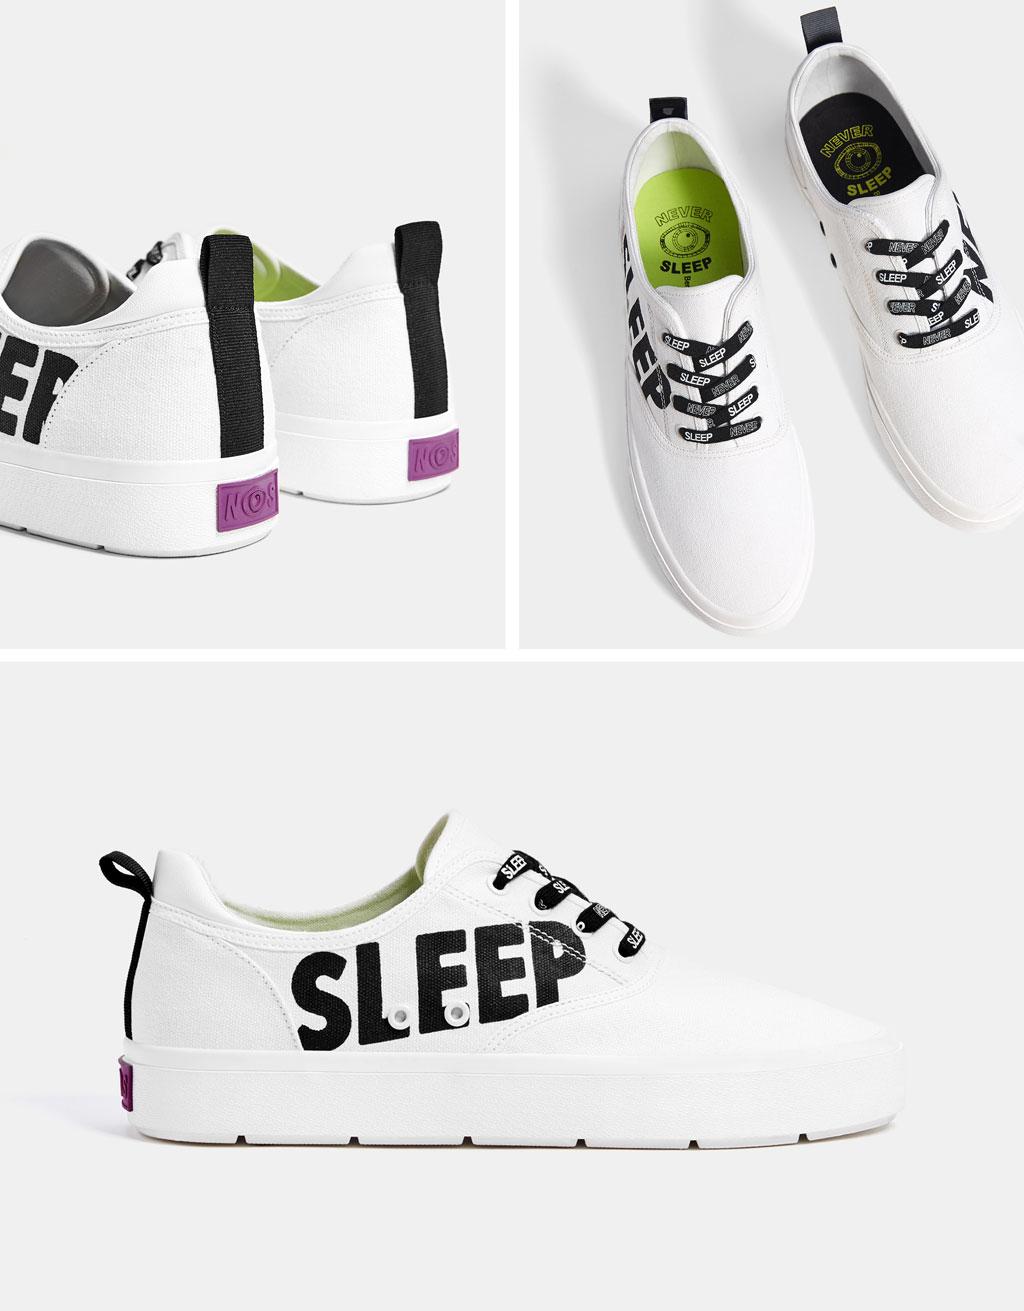 Pánské lehké textilní boty s nápisem